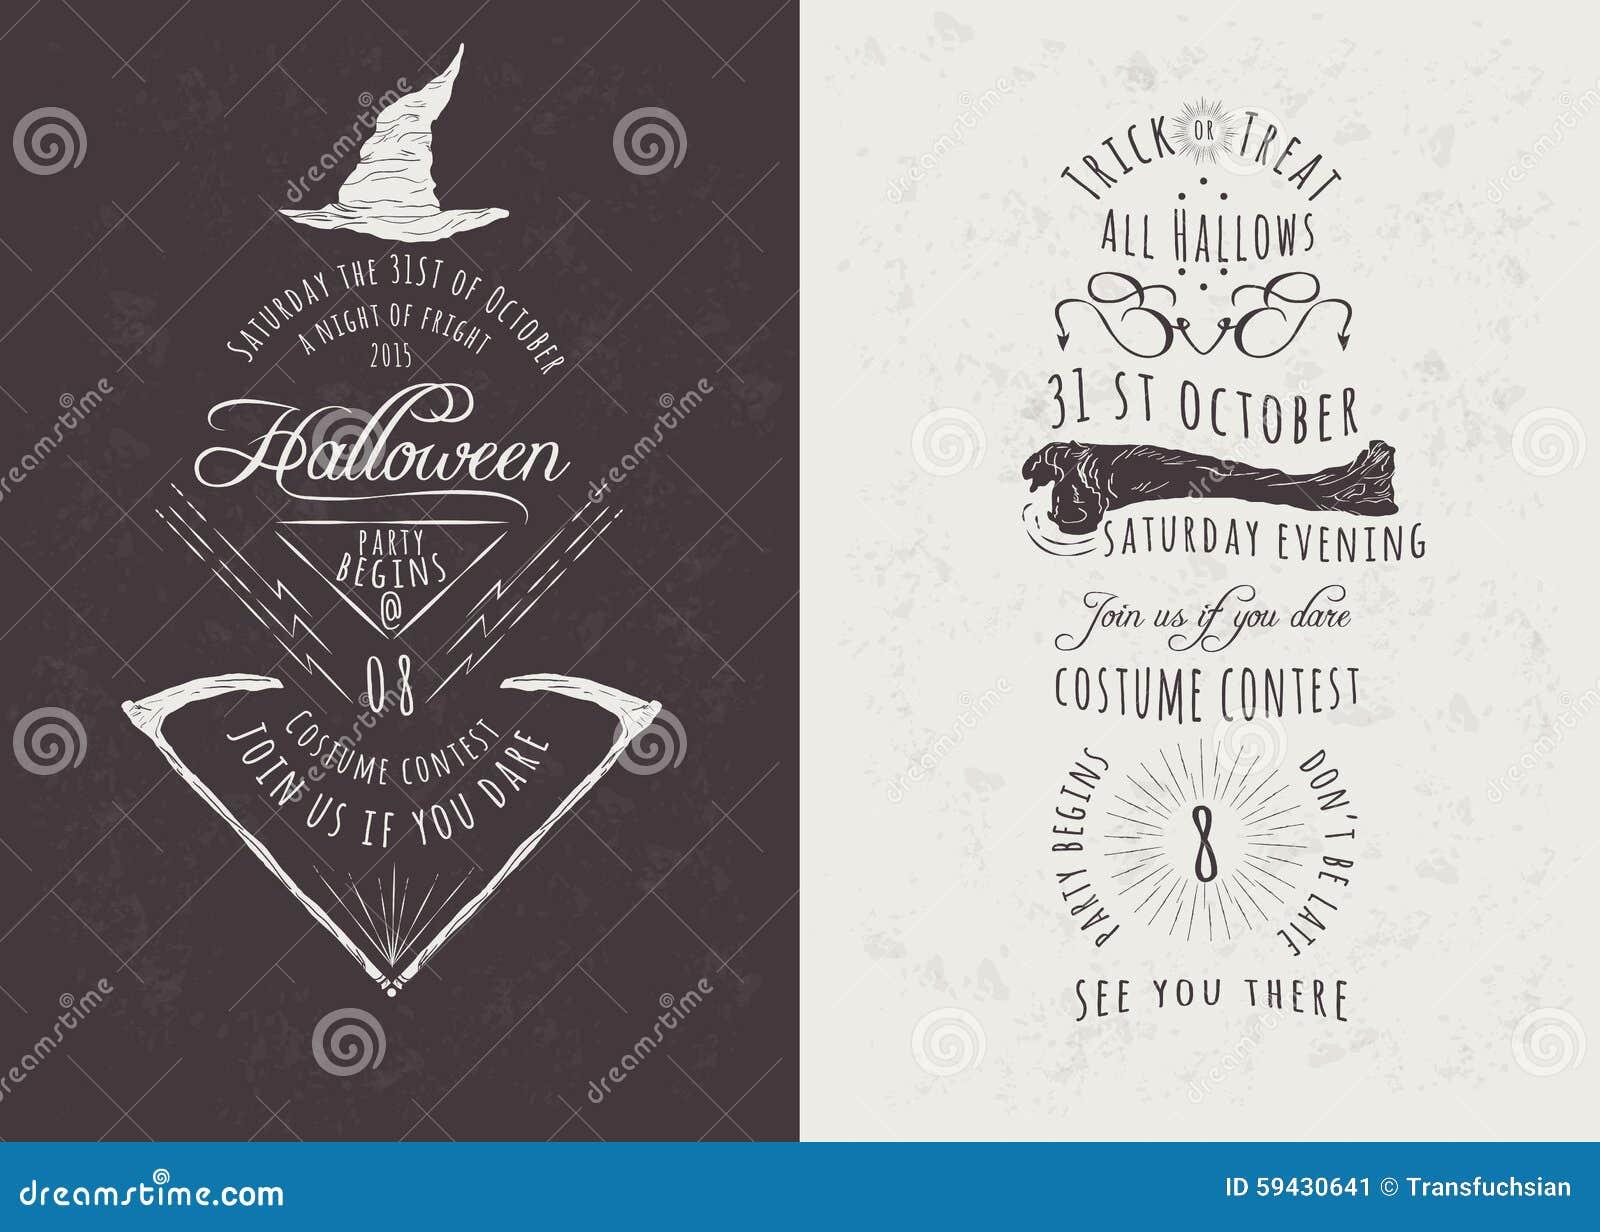 Vintage Happy Halloween Party Invitations Stock Vector ...